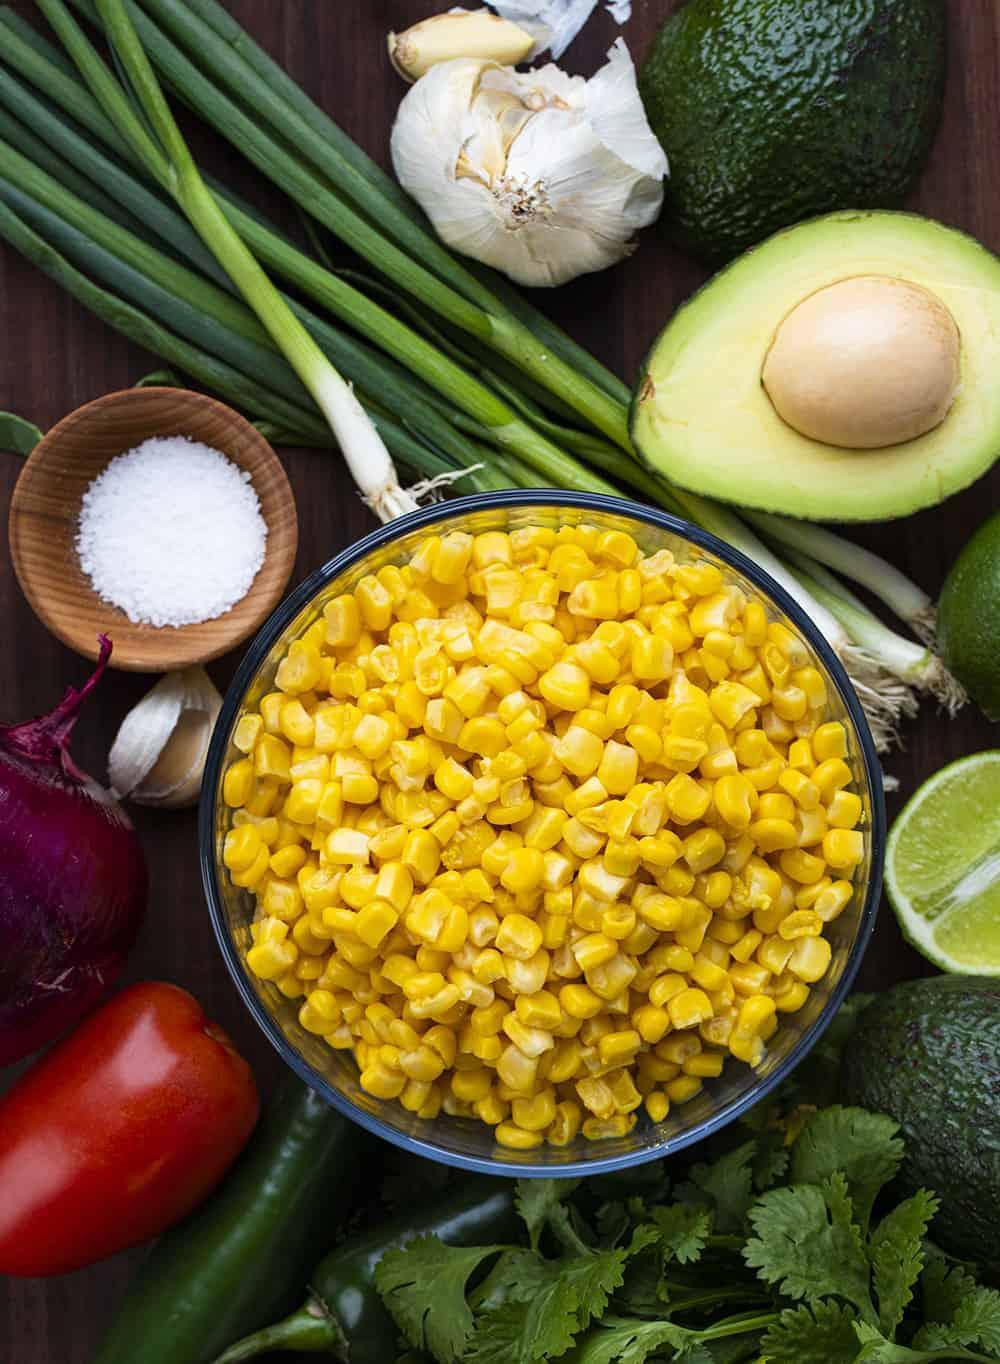 Raw Ingredients for Avocado Corn Salsa